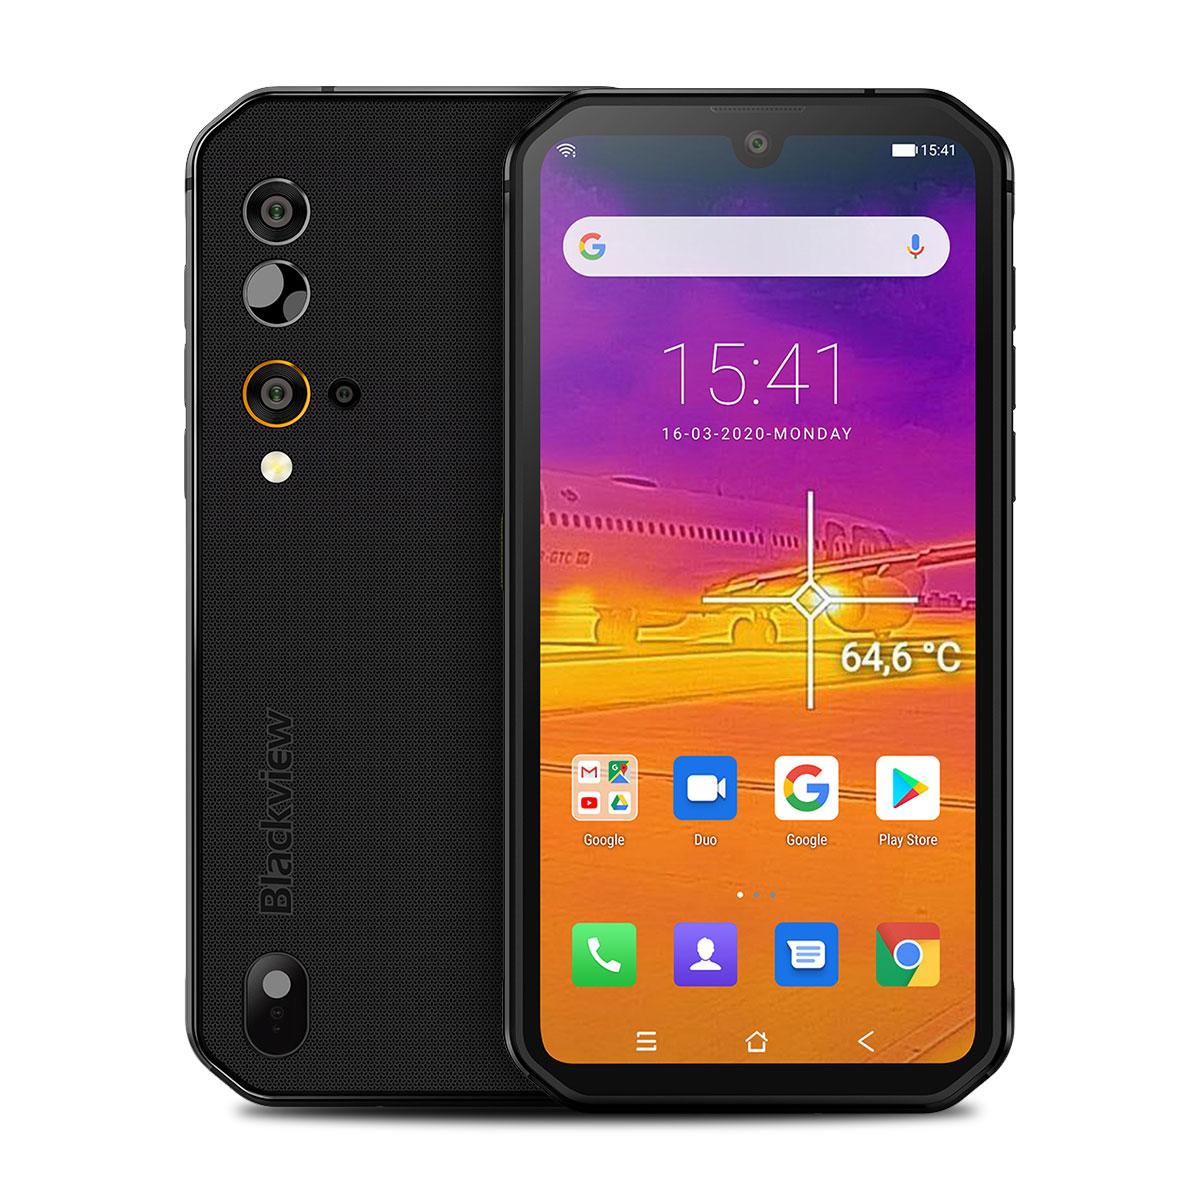 Blackview BV9900 Pro Thermal Camera Mobile Phone Helio P90 Octa Core 8GB+128GB IP68 Rugged Smartphone 48MP Quad Rear Camera Silver_European regulations